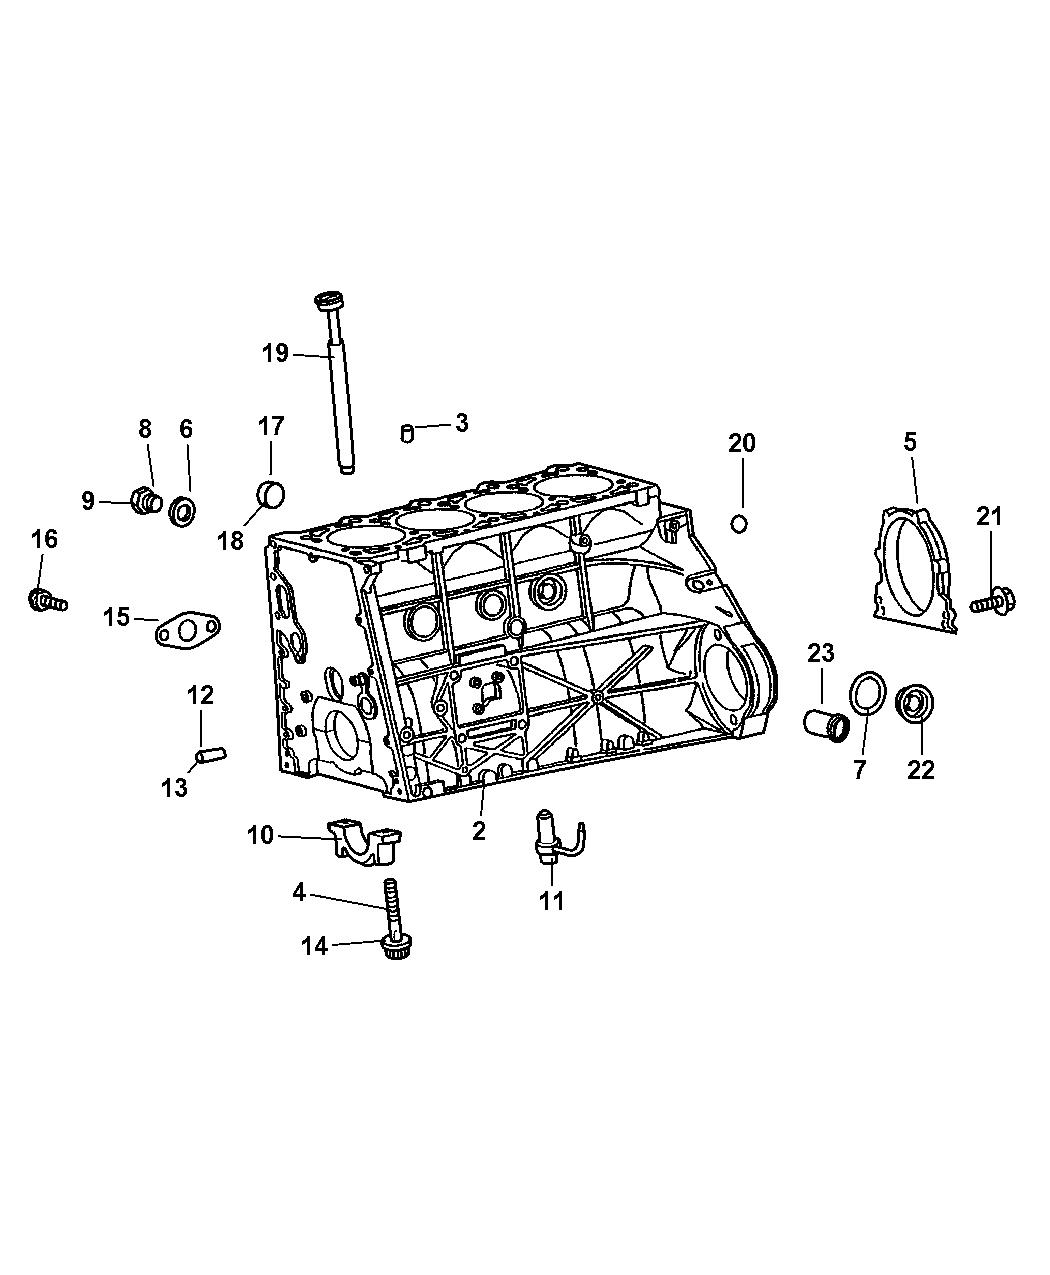 5073861aa Genuine Chrysler Connector 2009 Pt Cruiser Engine Diagram Cylinder Block Hardware